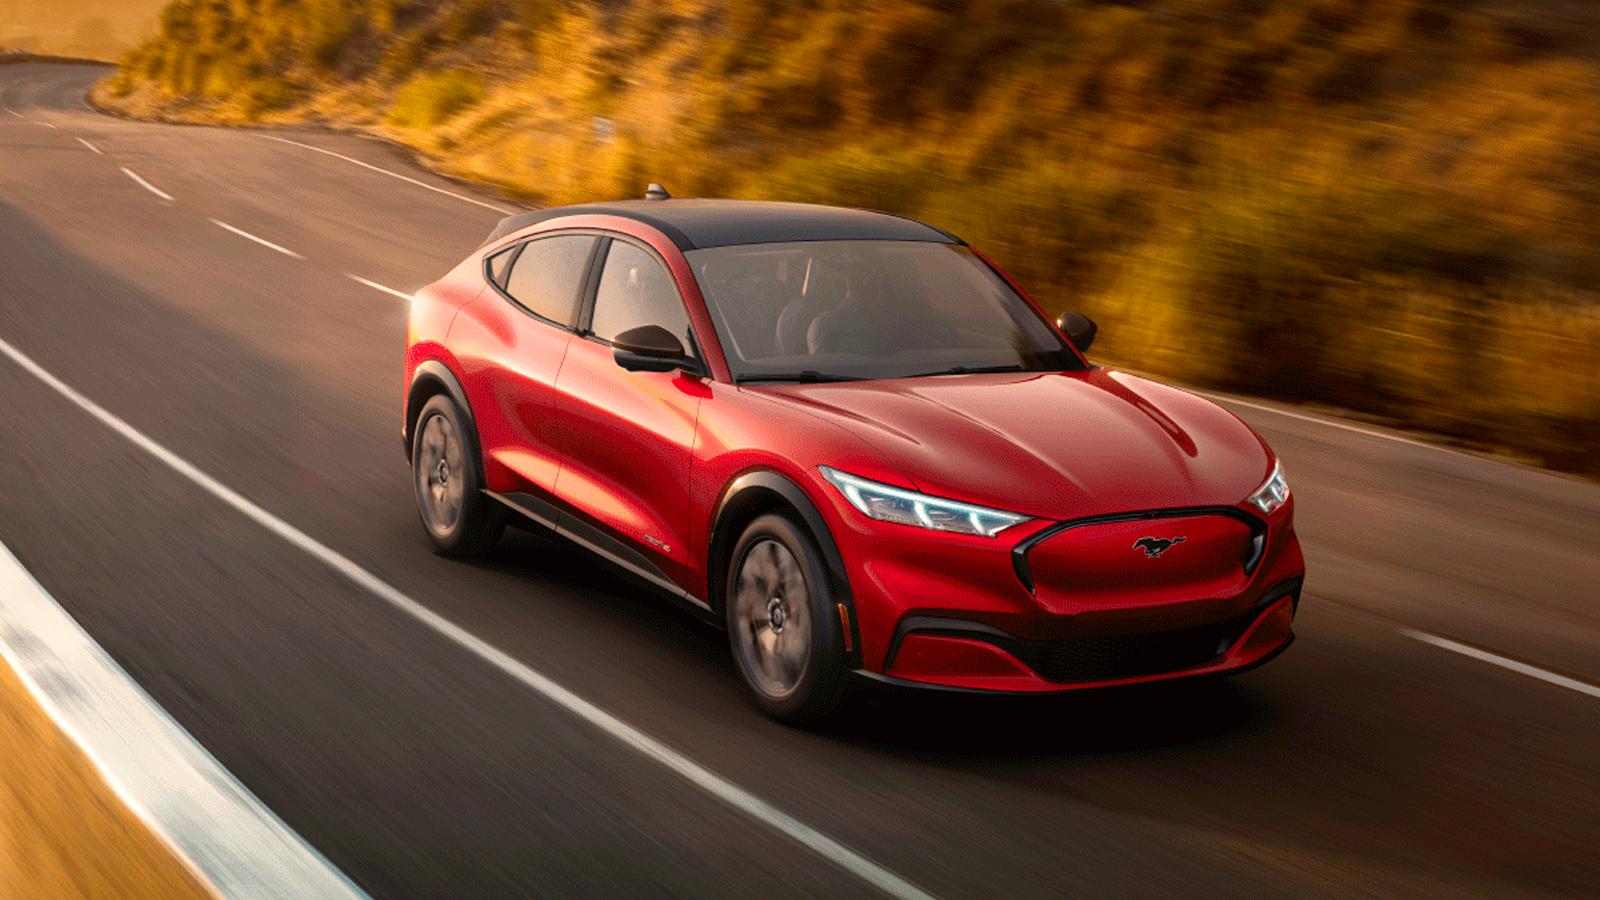 Mustang-Mach-E-Al-Piemonte-Ford